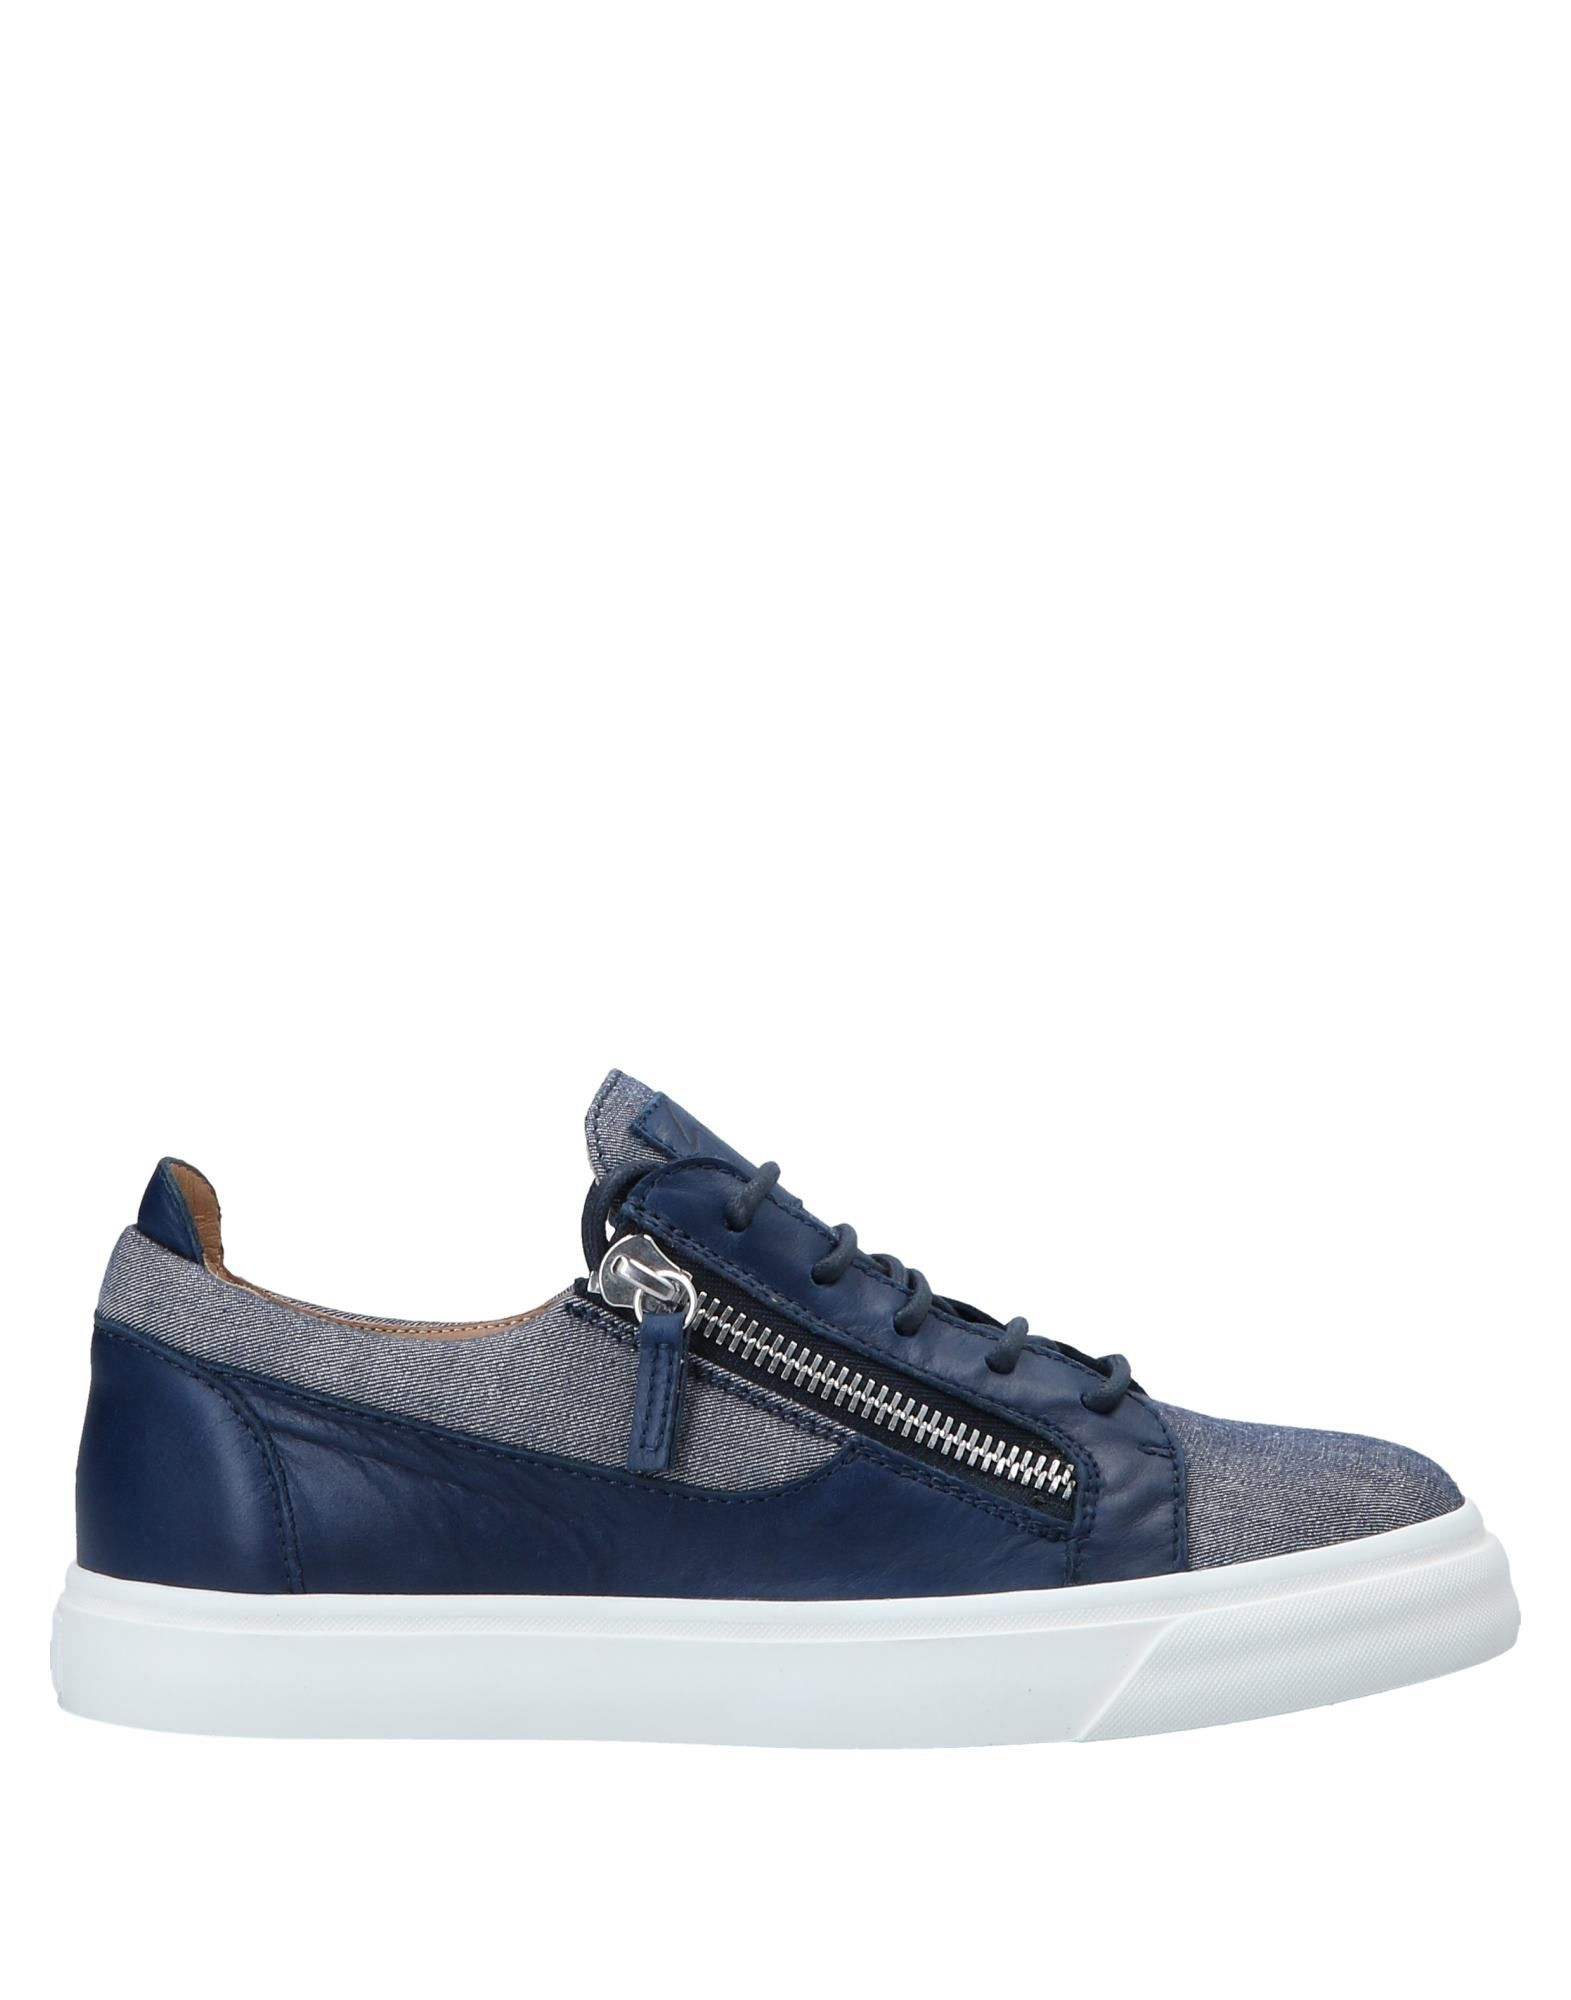 Sneakers Giuseppe Zanotti Homme - Sneakers Giuseppe Zanotti  Bleu foncé Mode pas cher et belle